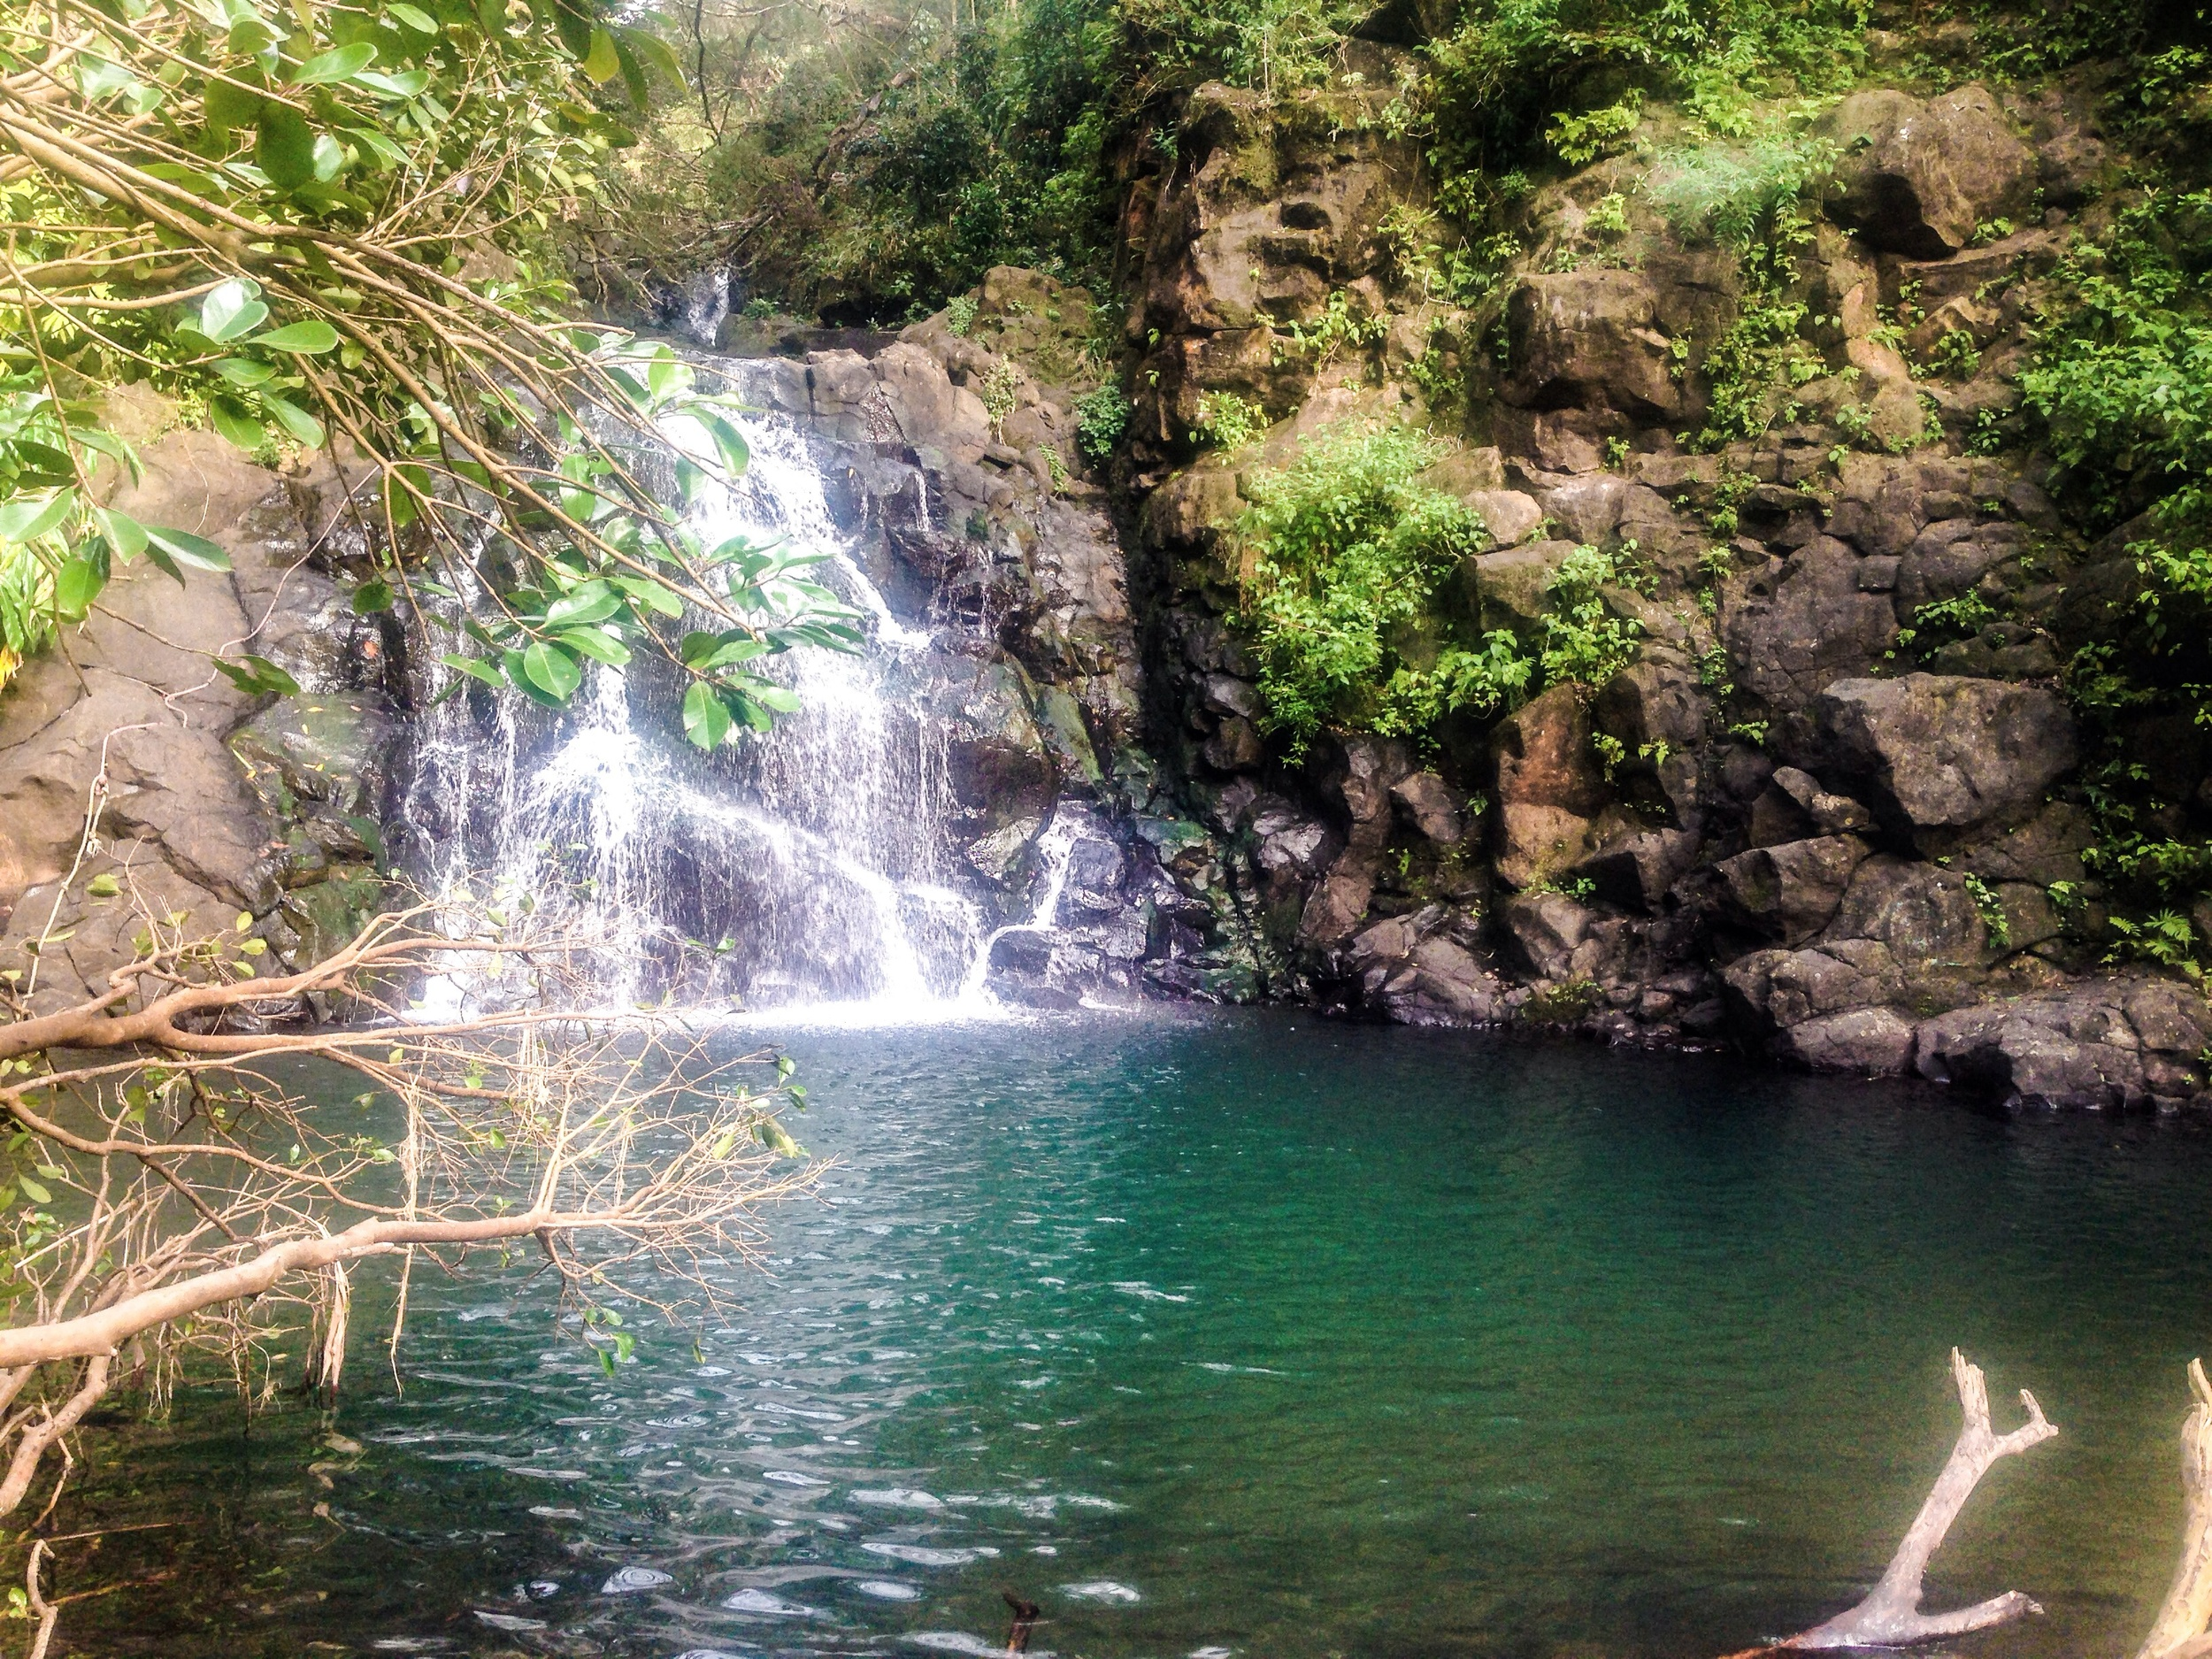 Beautiful water fall!